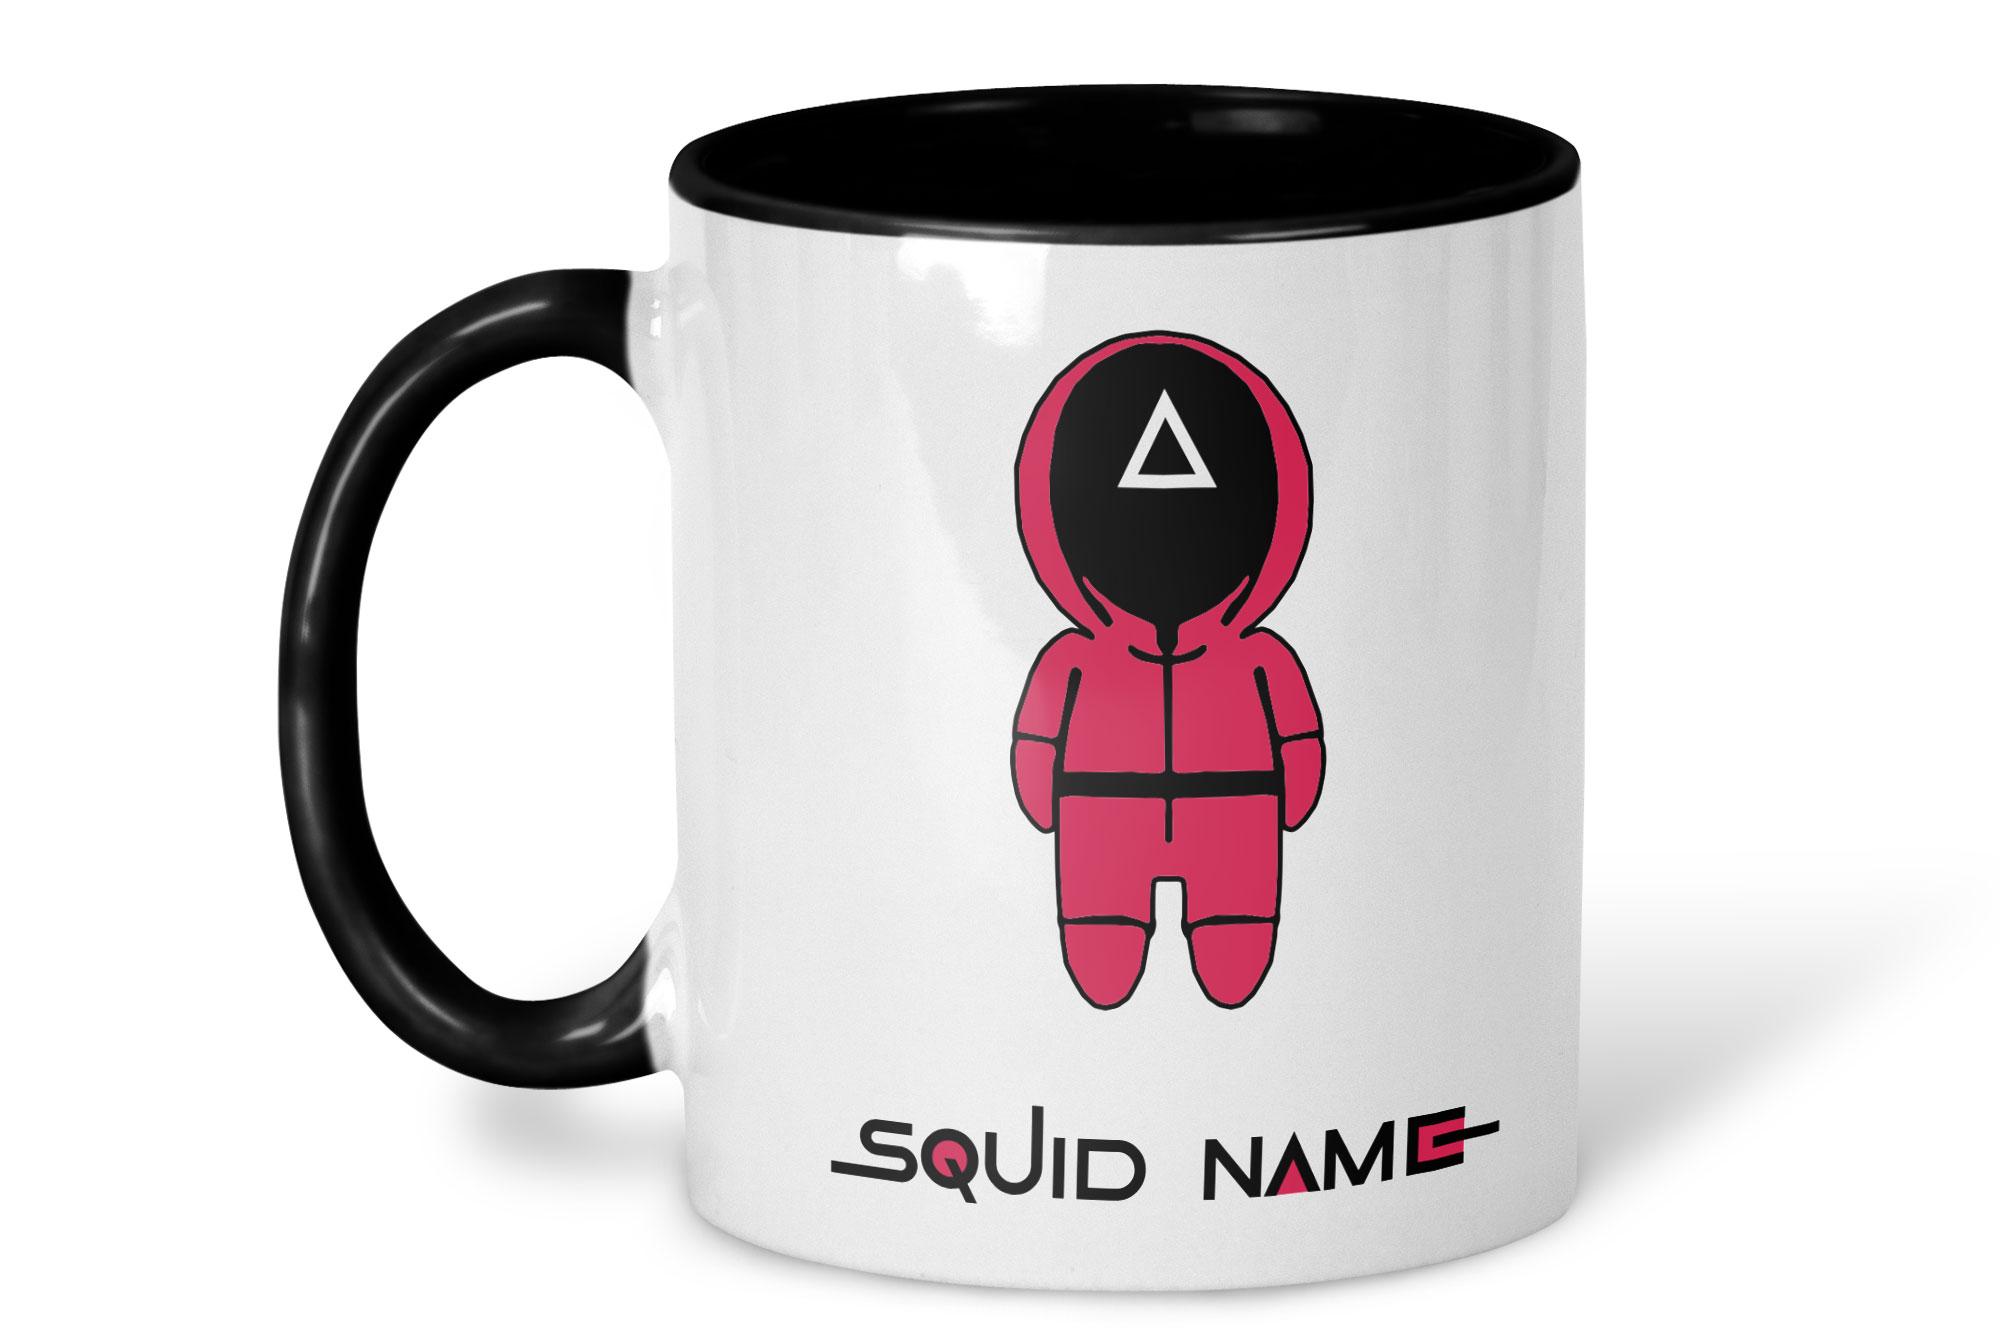 Squid Game Personalised Mug on white background